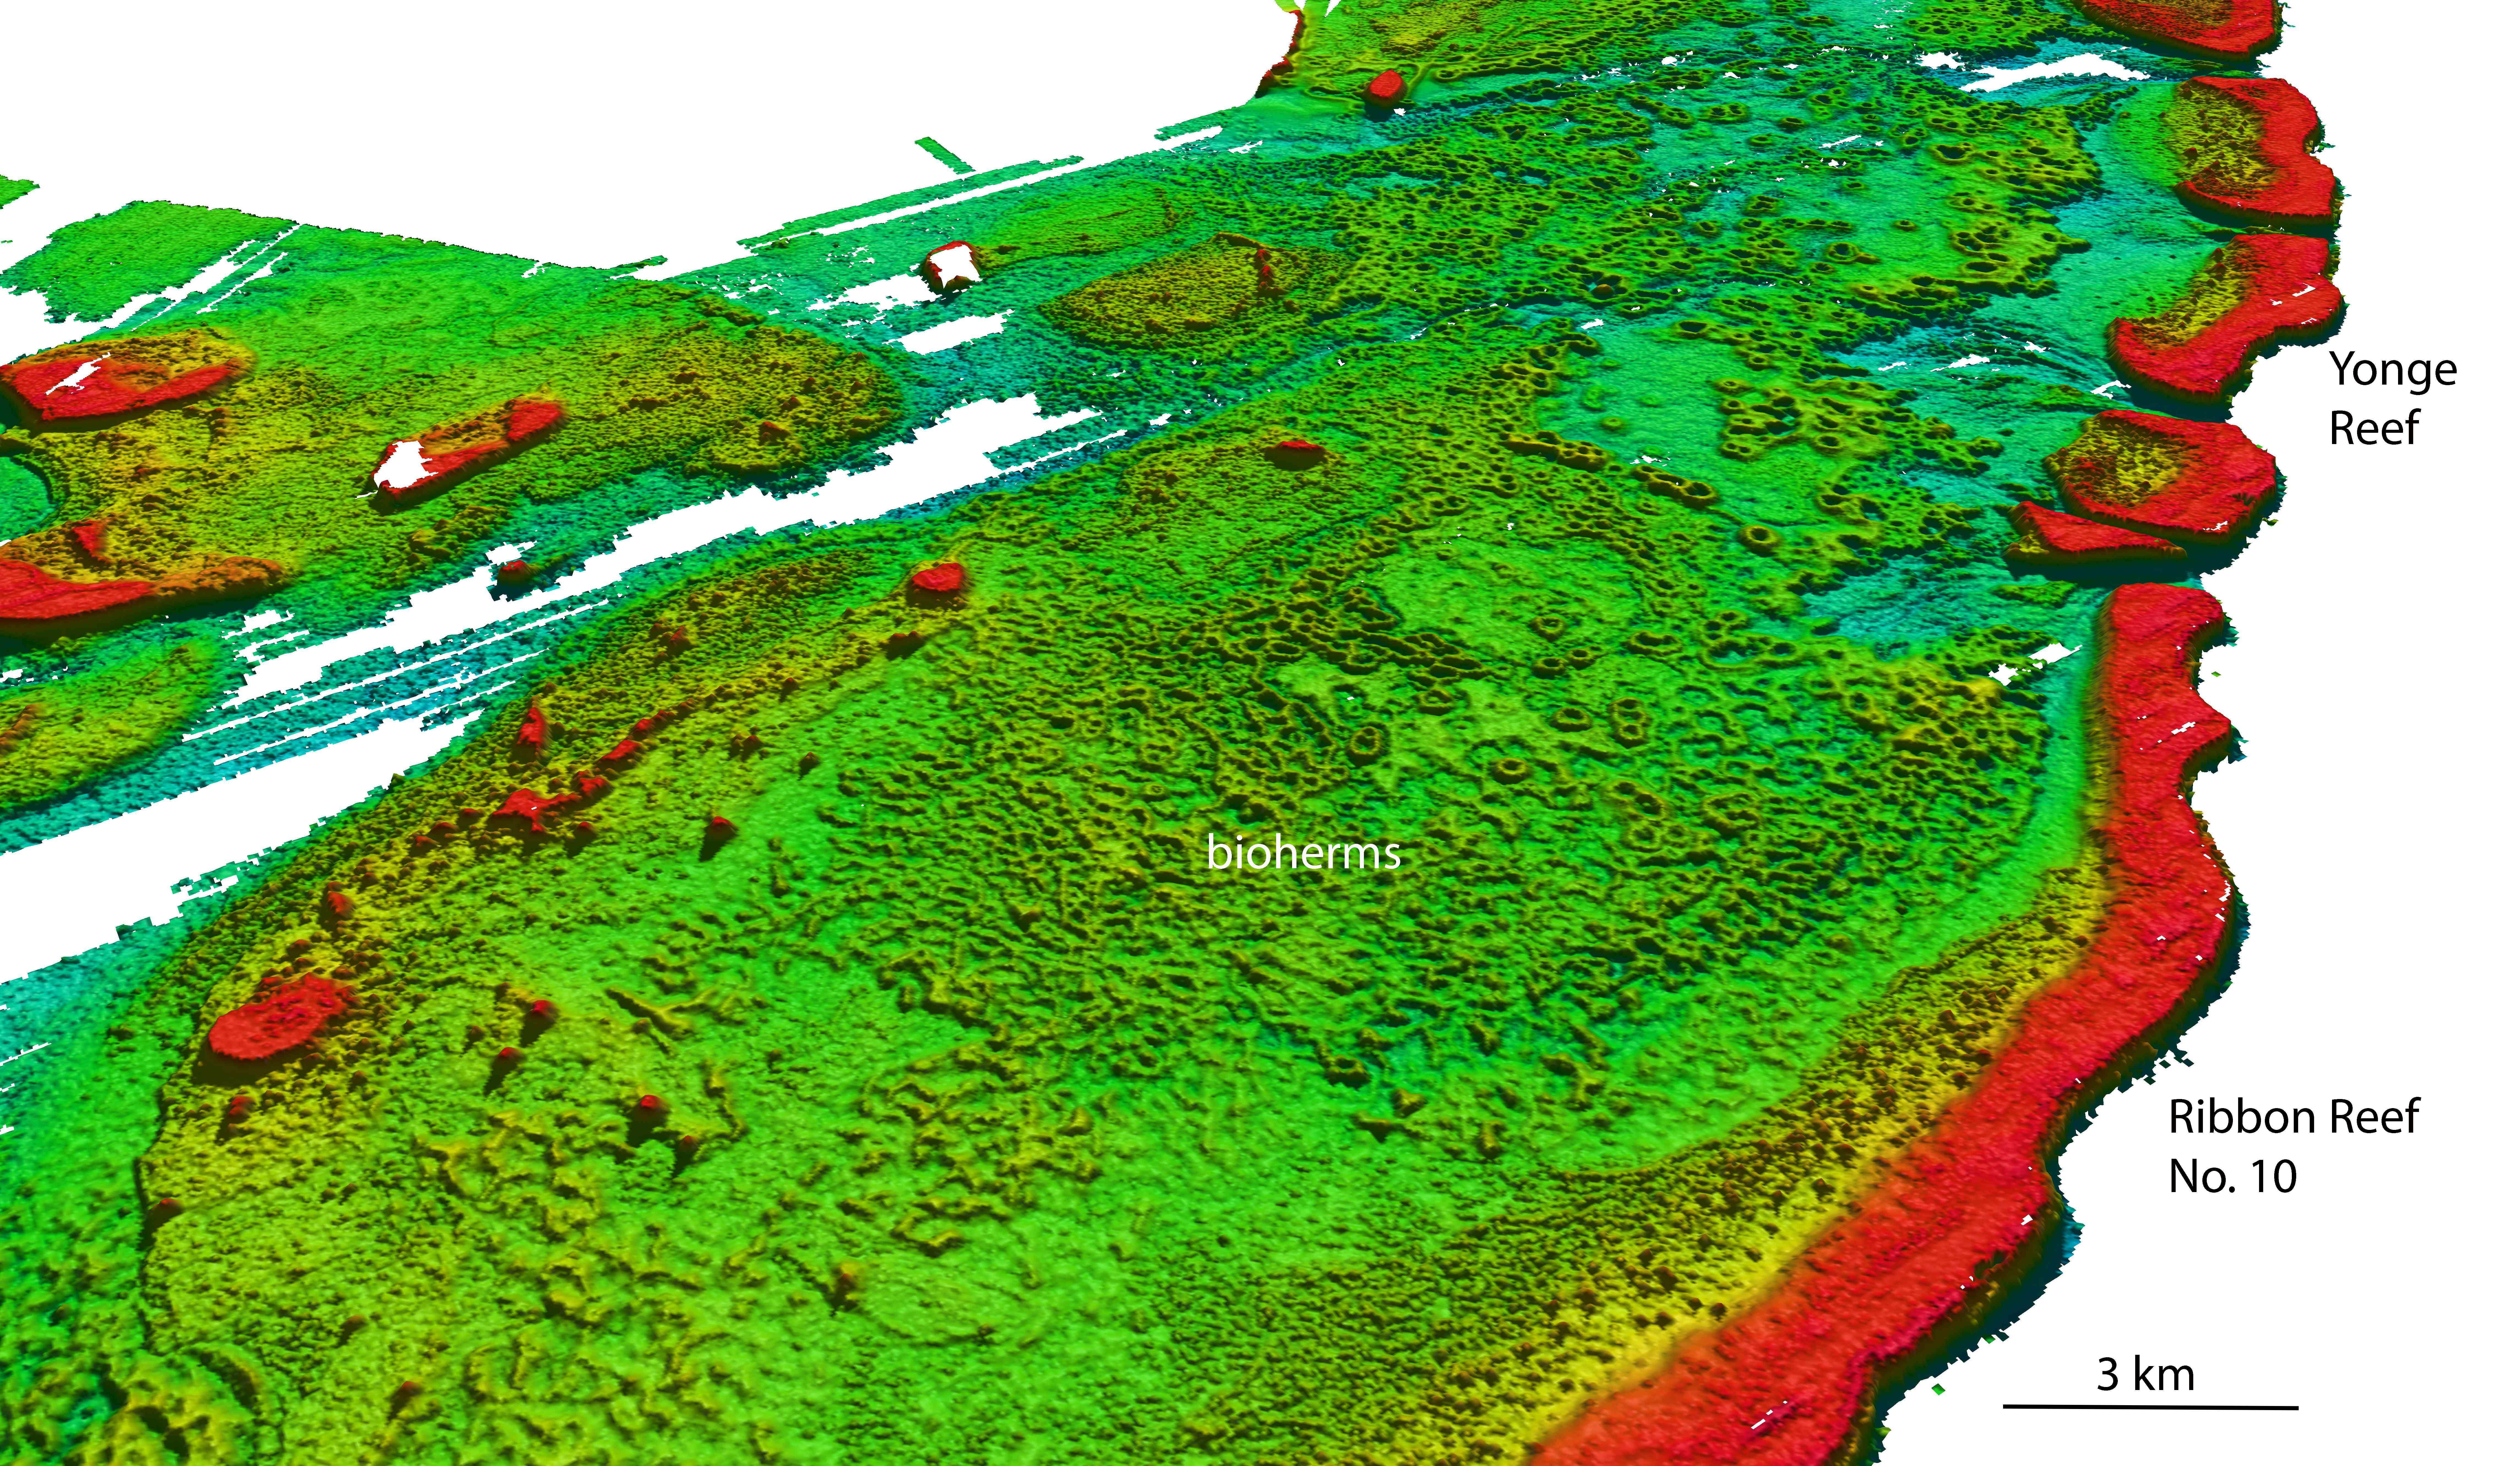 LiDAR view of bioherms at Great Barrier Reef